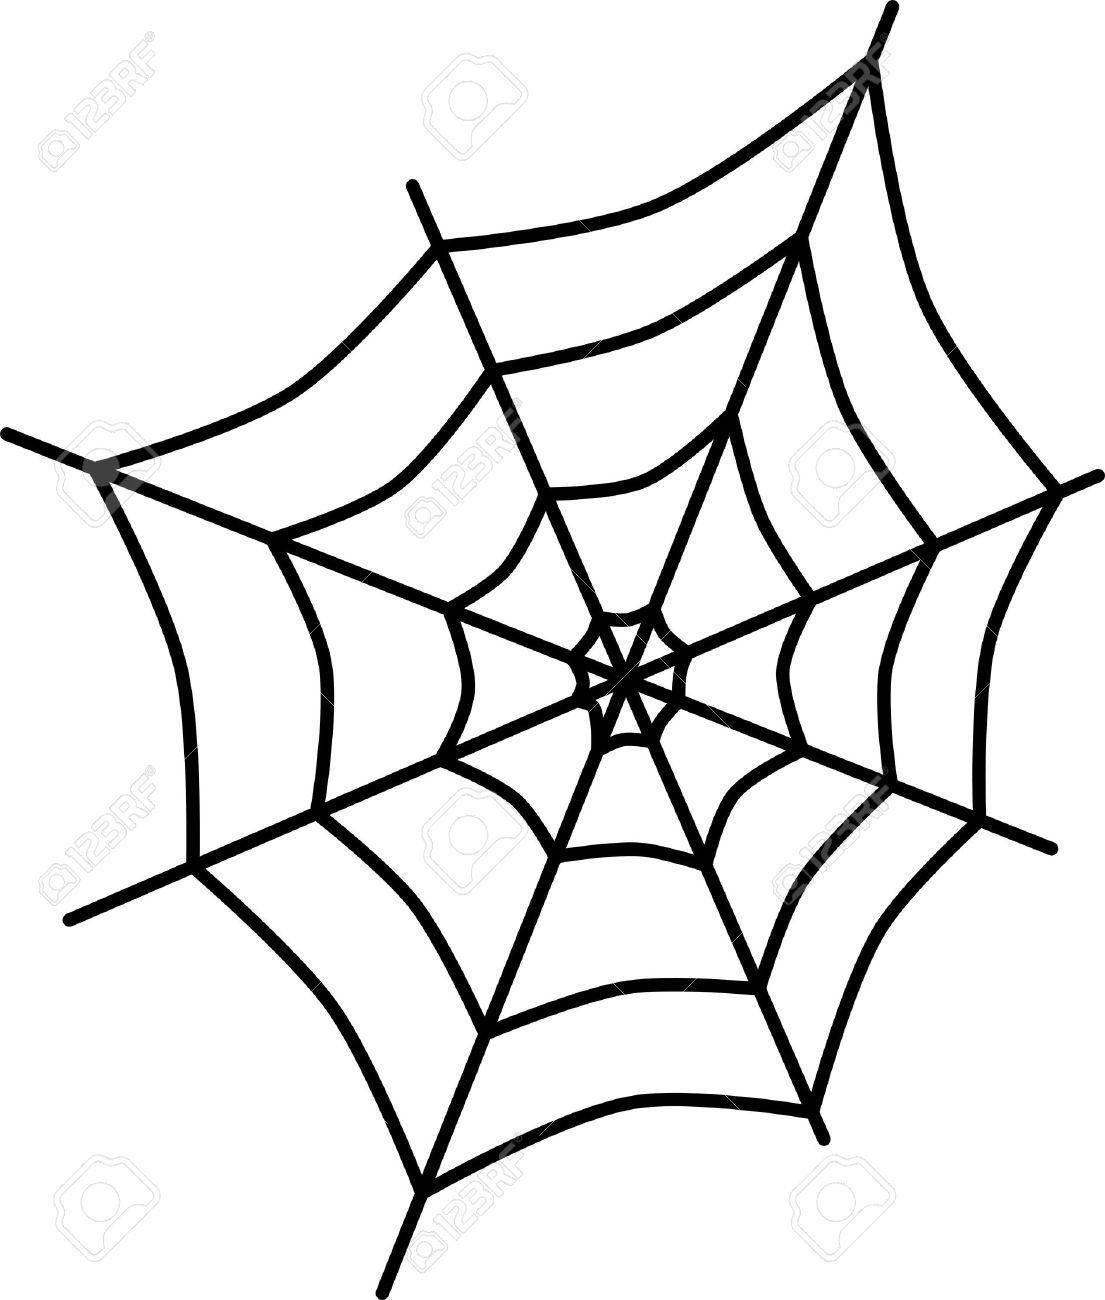 1105x1300 Spider Web Cartoon Drawing Cartoon Spider Web Clipart